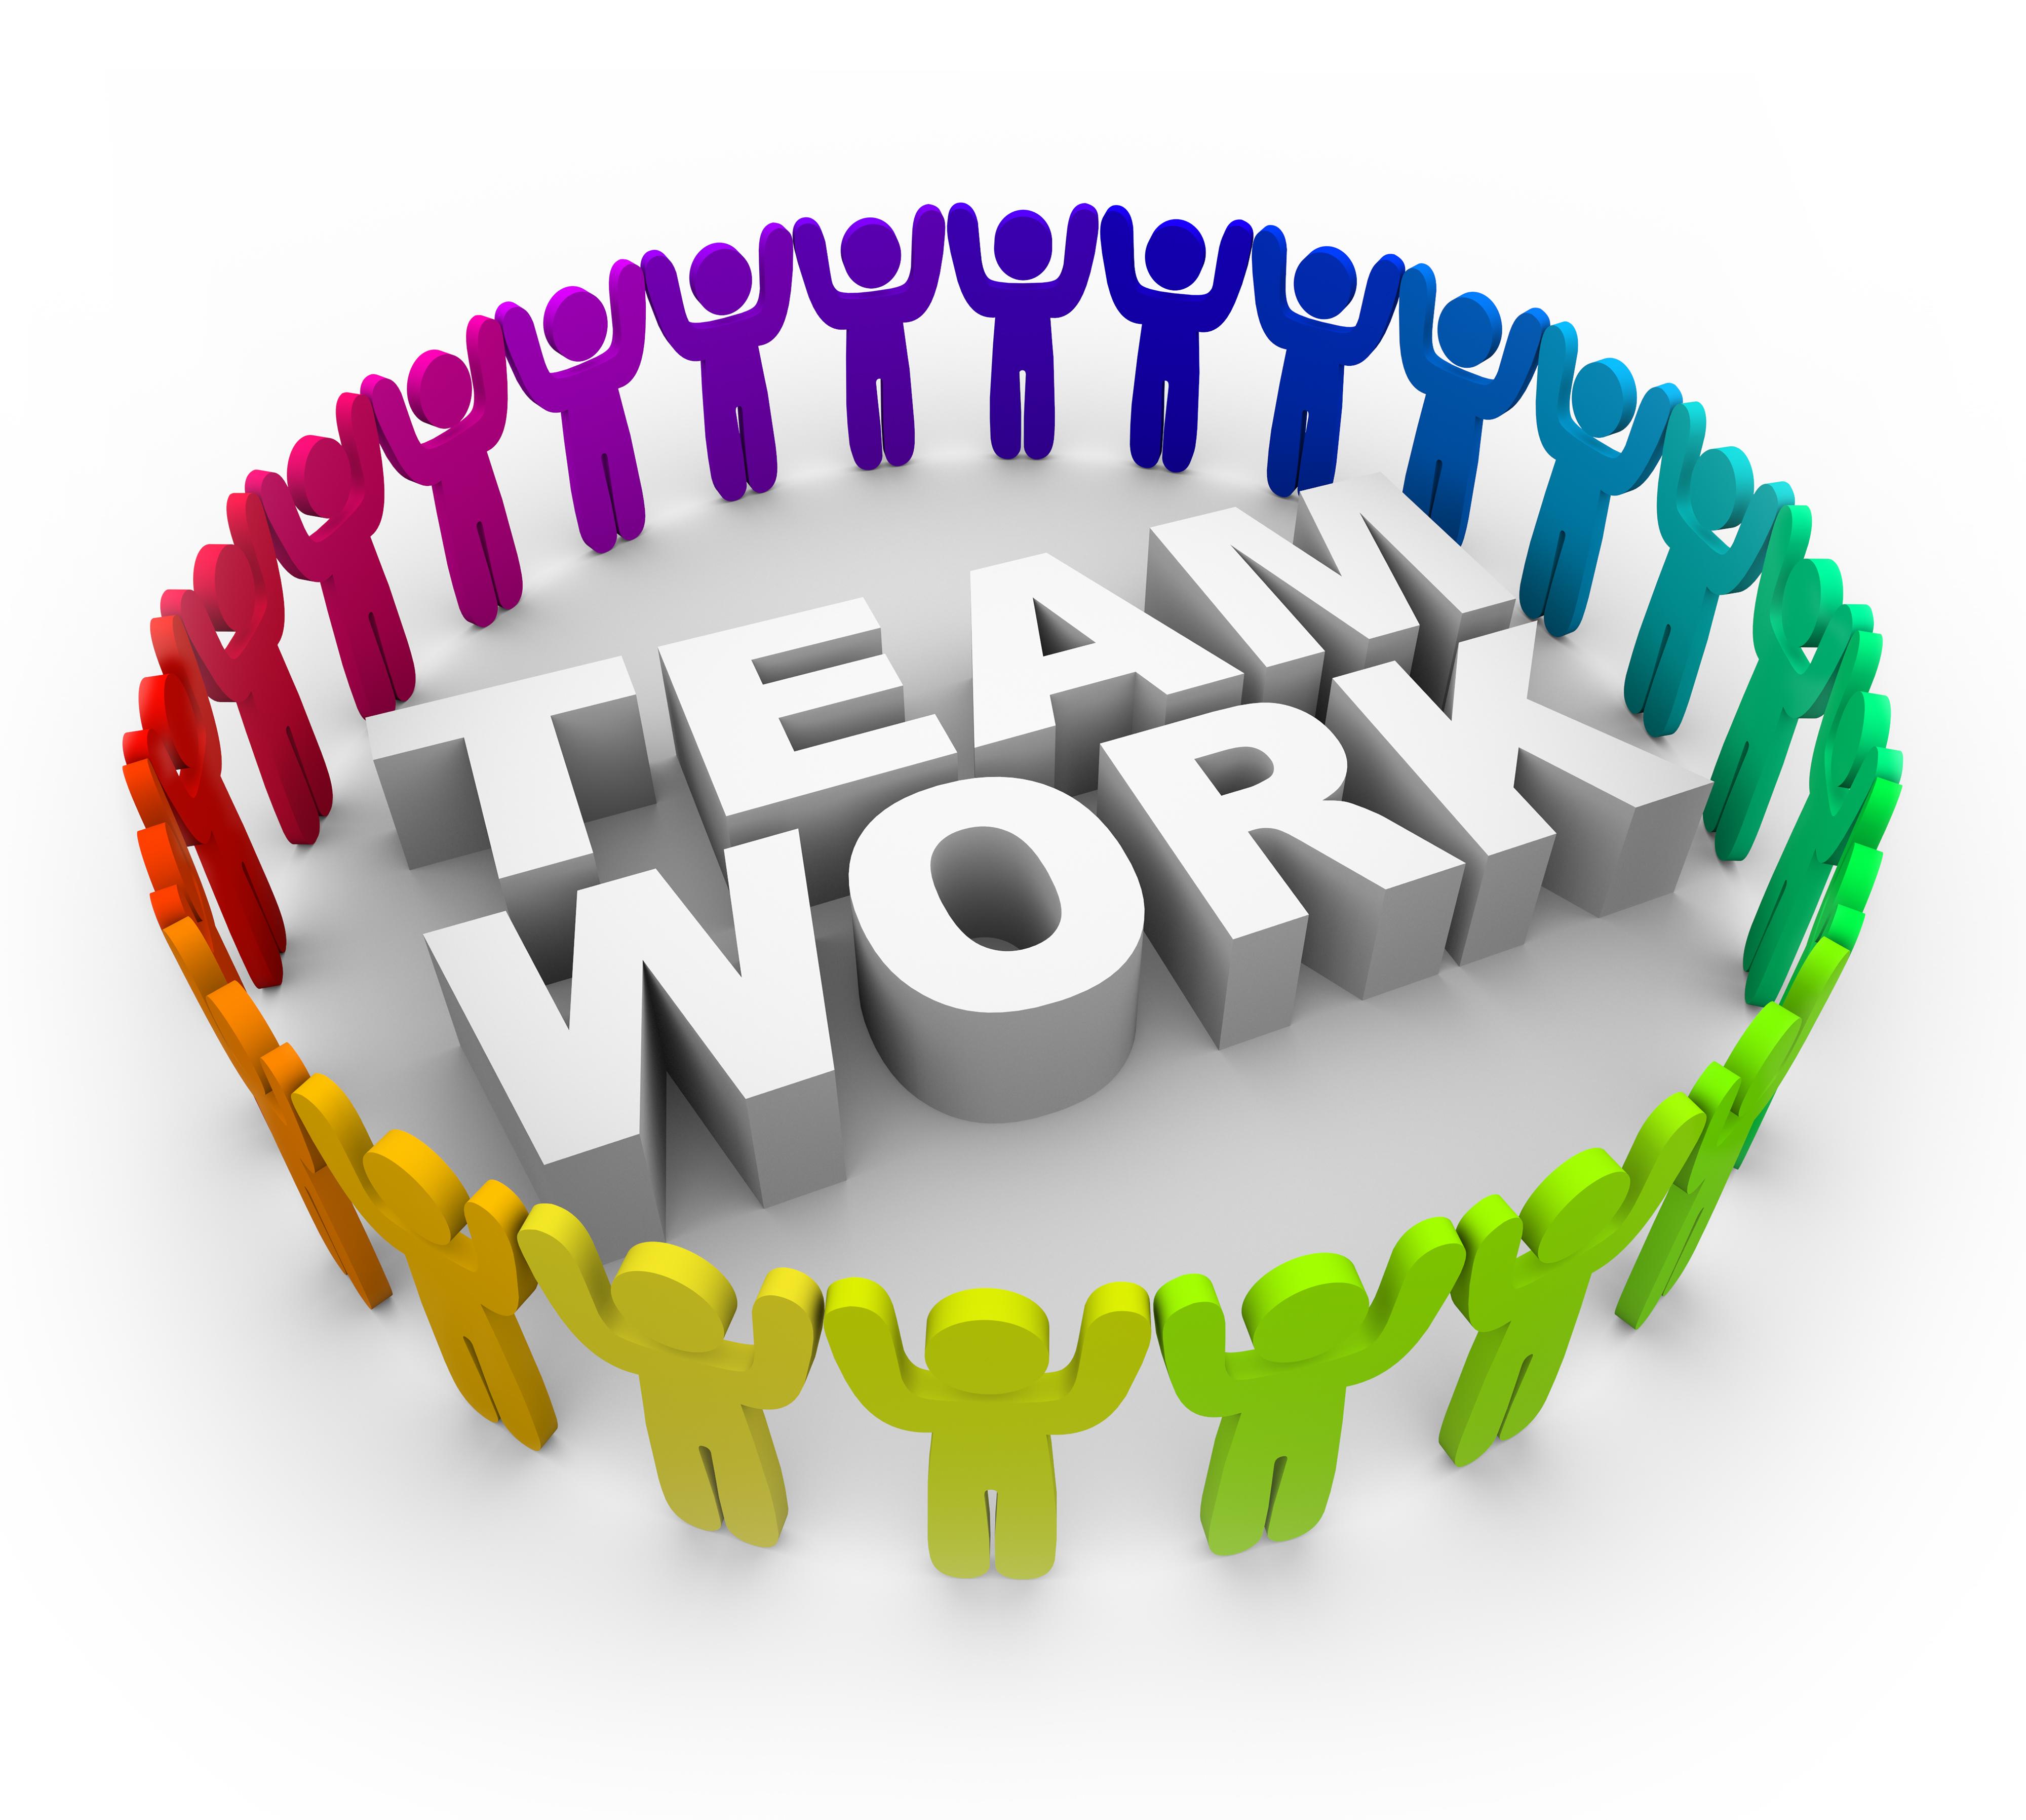 Teamwork clipart 2